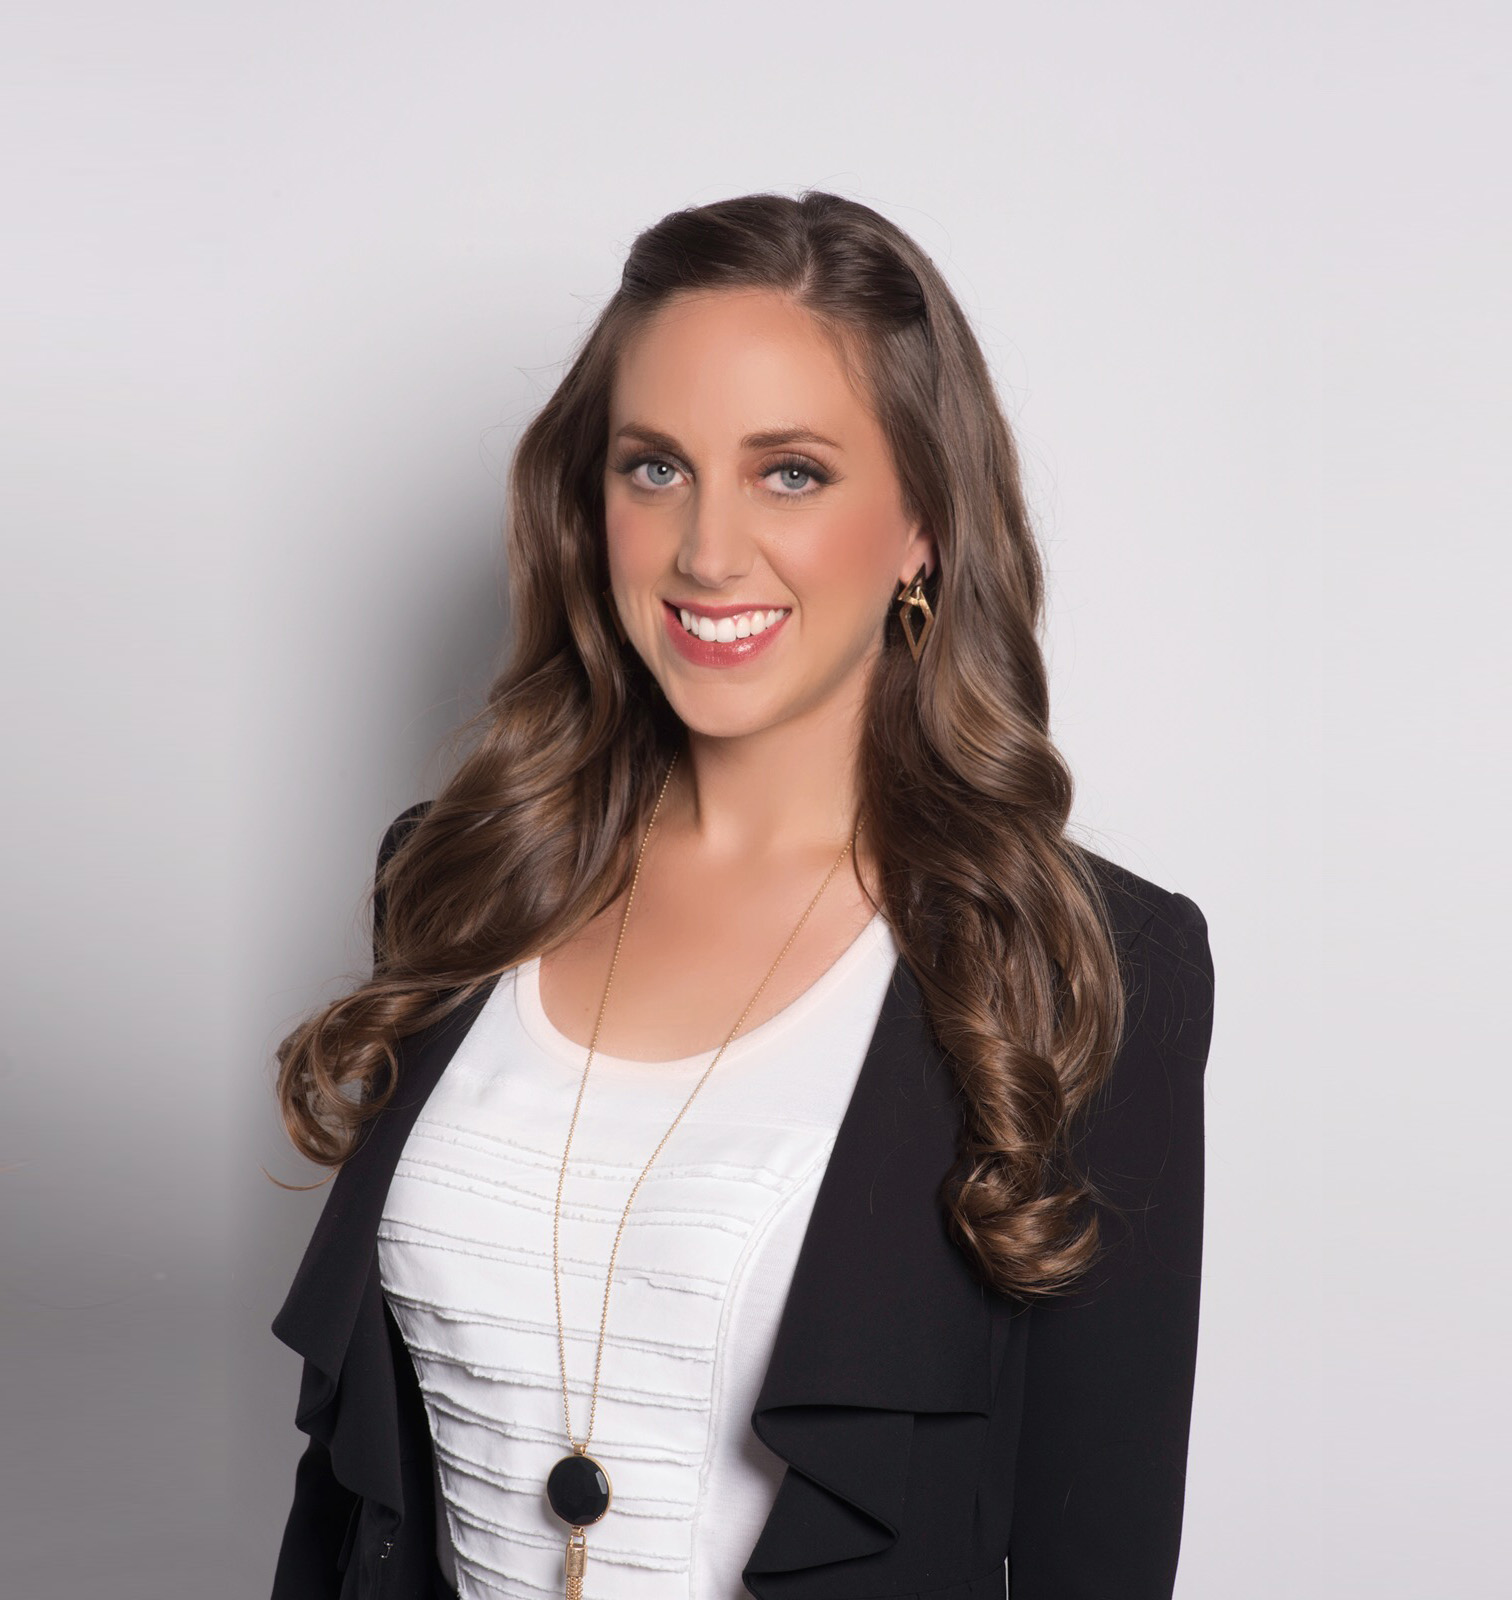 Christina Fitzpatrick